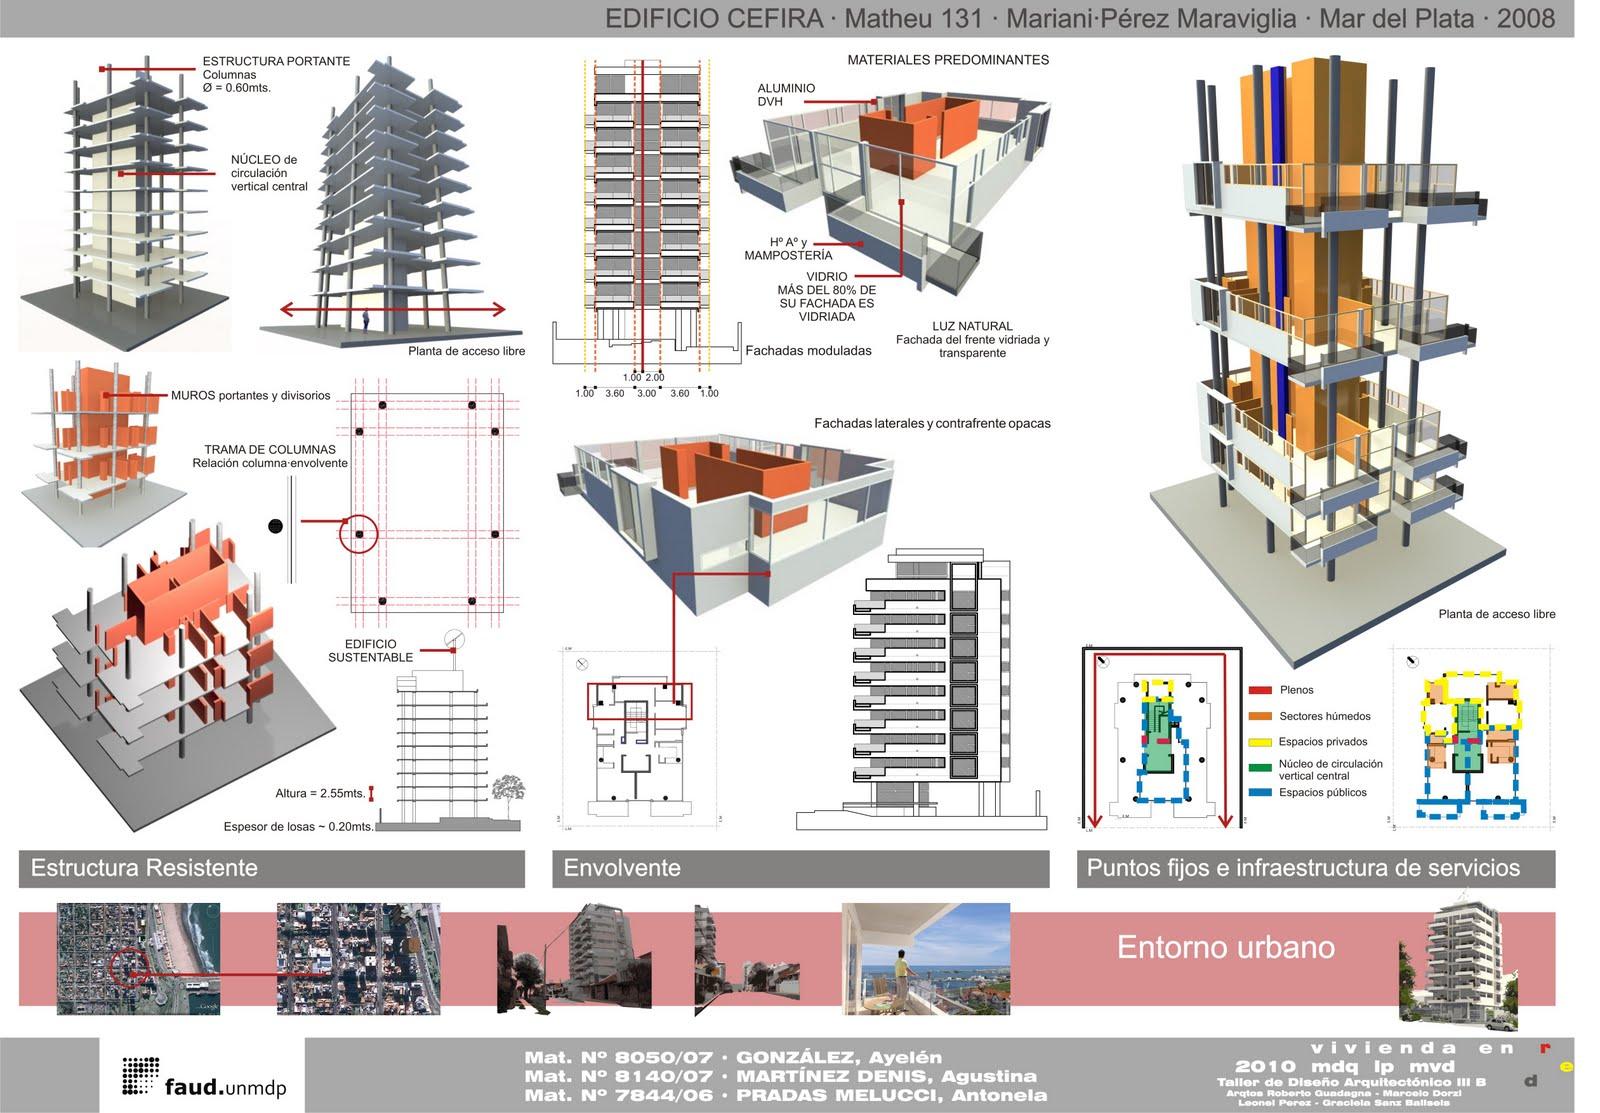 Dise o 3 abril 2010 for Tipos de mobiliario urbano pdf